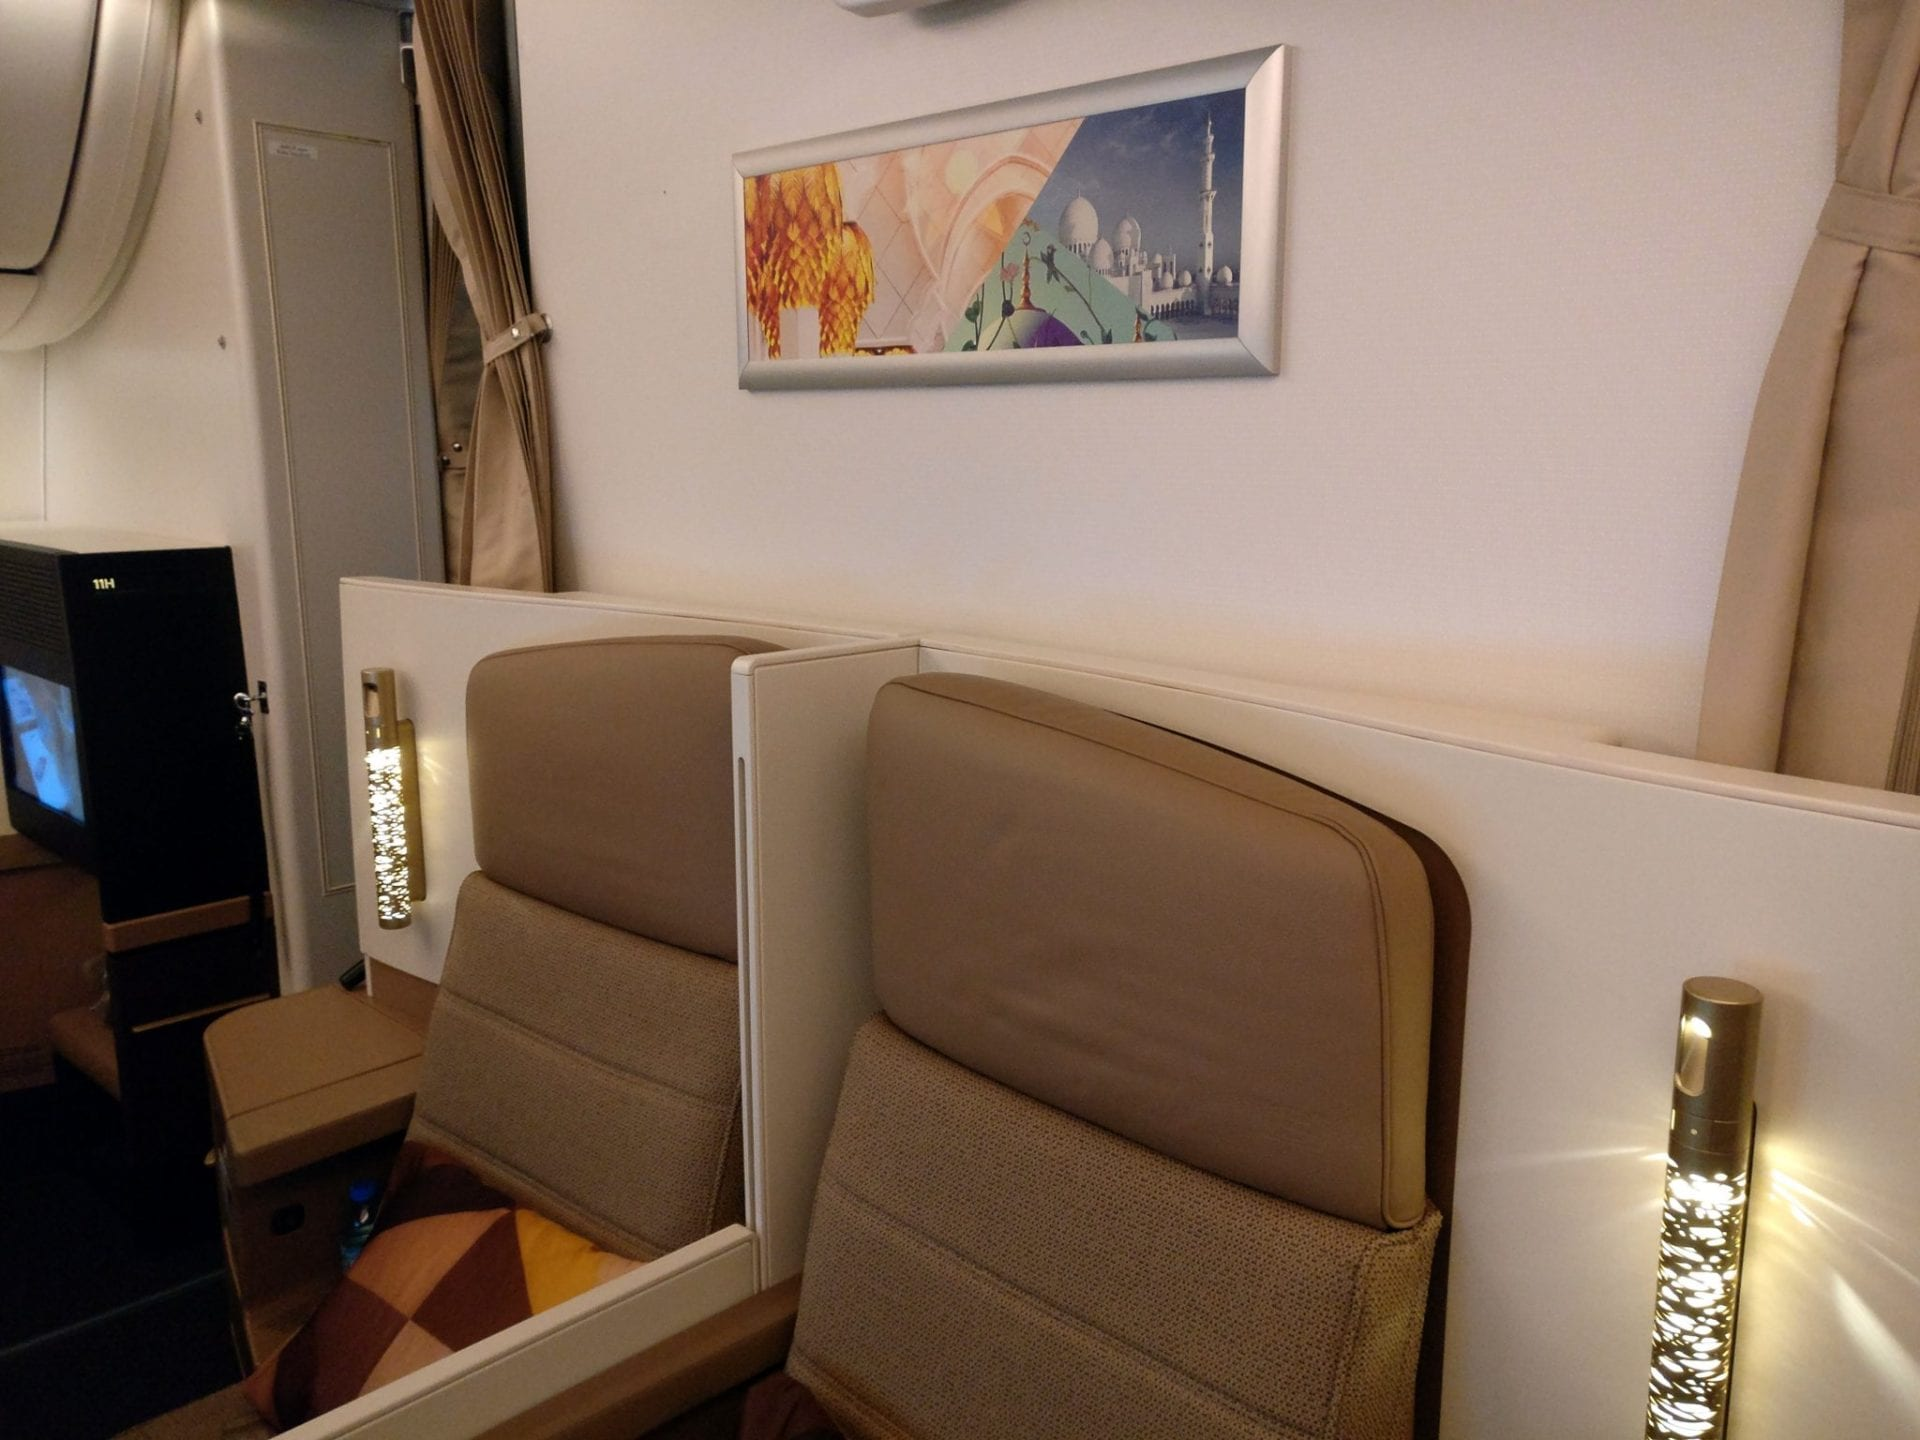 etihad-airways-boeing-787-business-class-seat-10